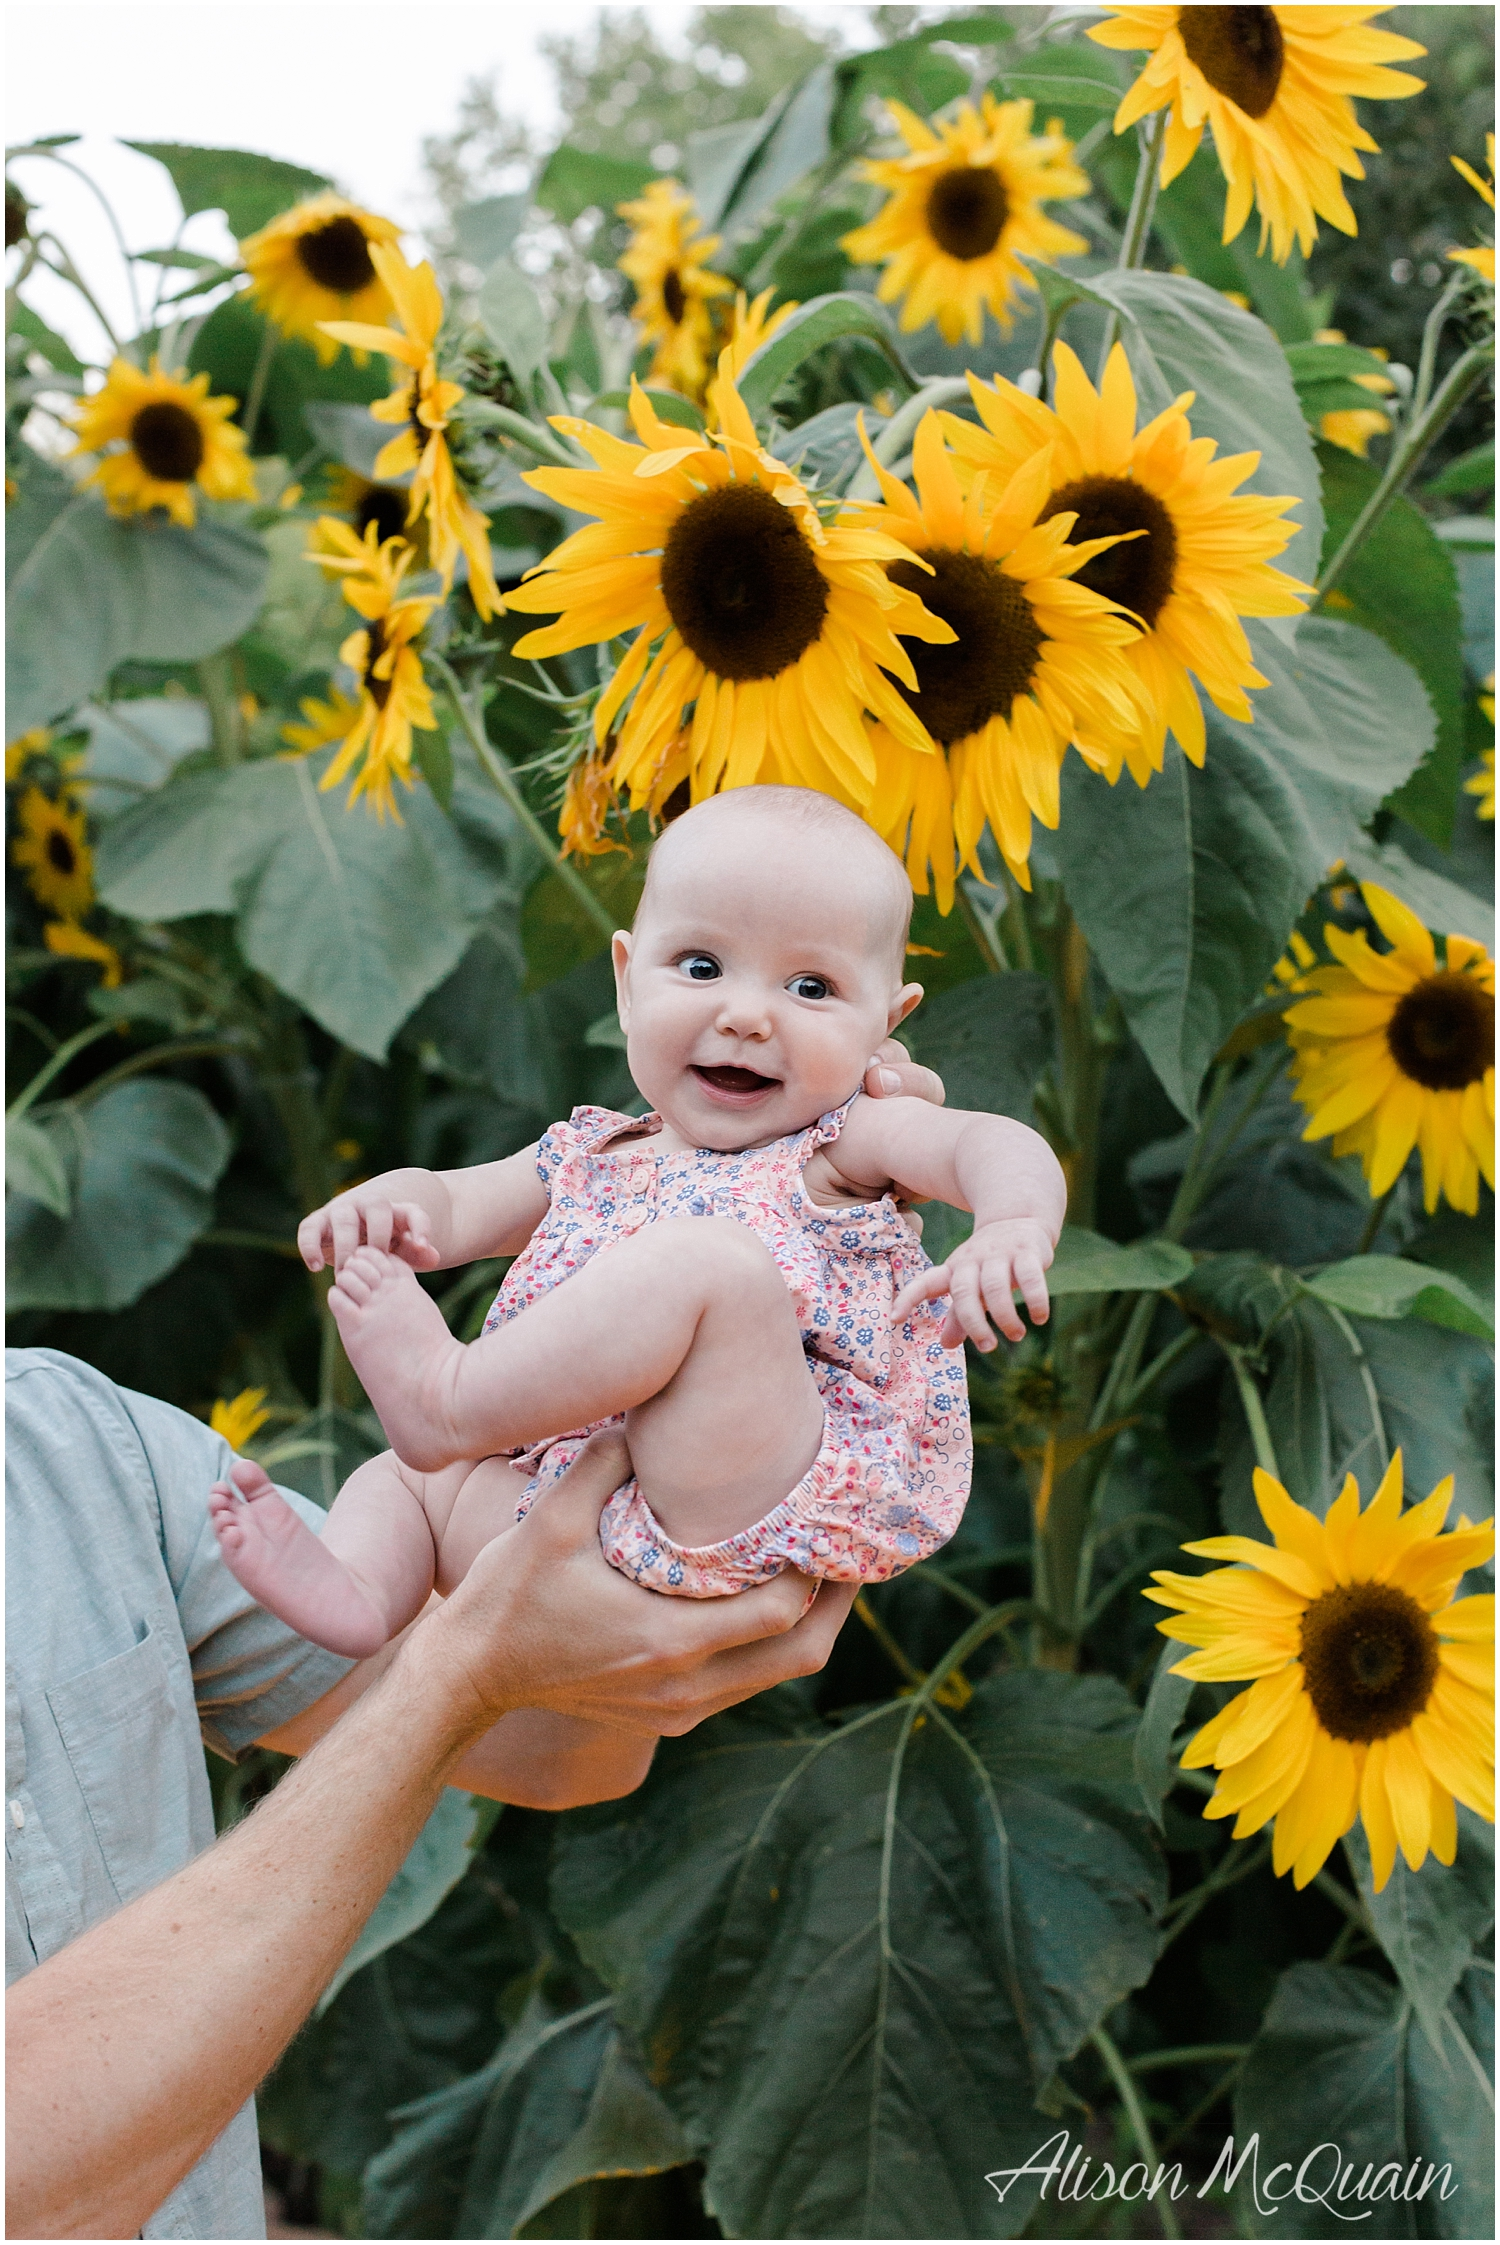 Claire_DenverBotanicGarden_Family_foreveryseason_AMPhoto_Aug2018_0035.jpg